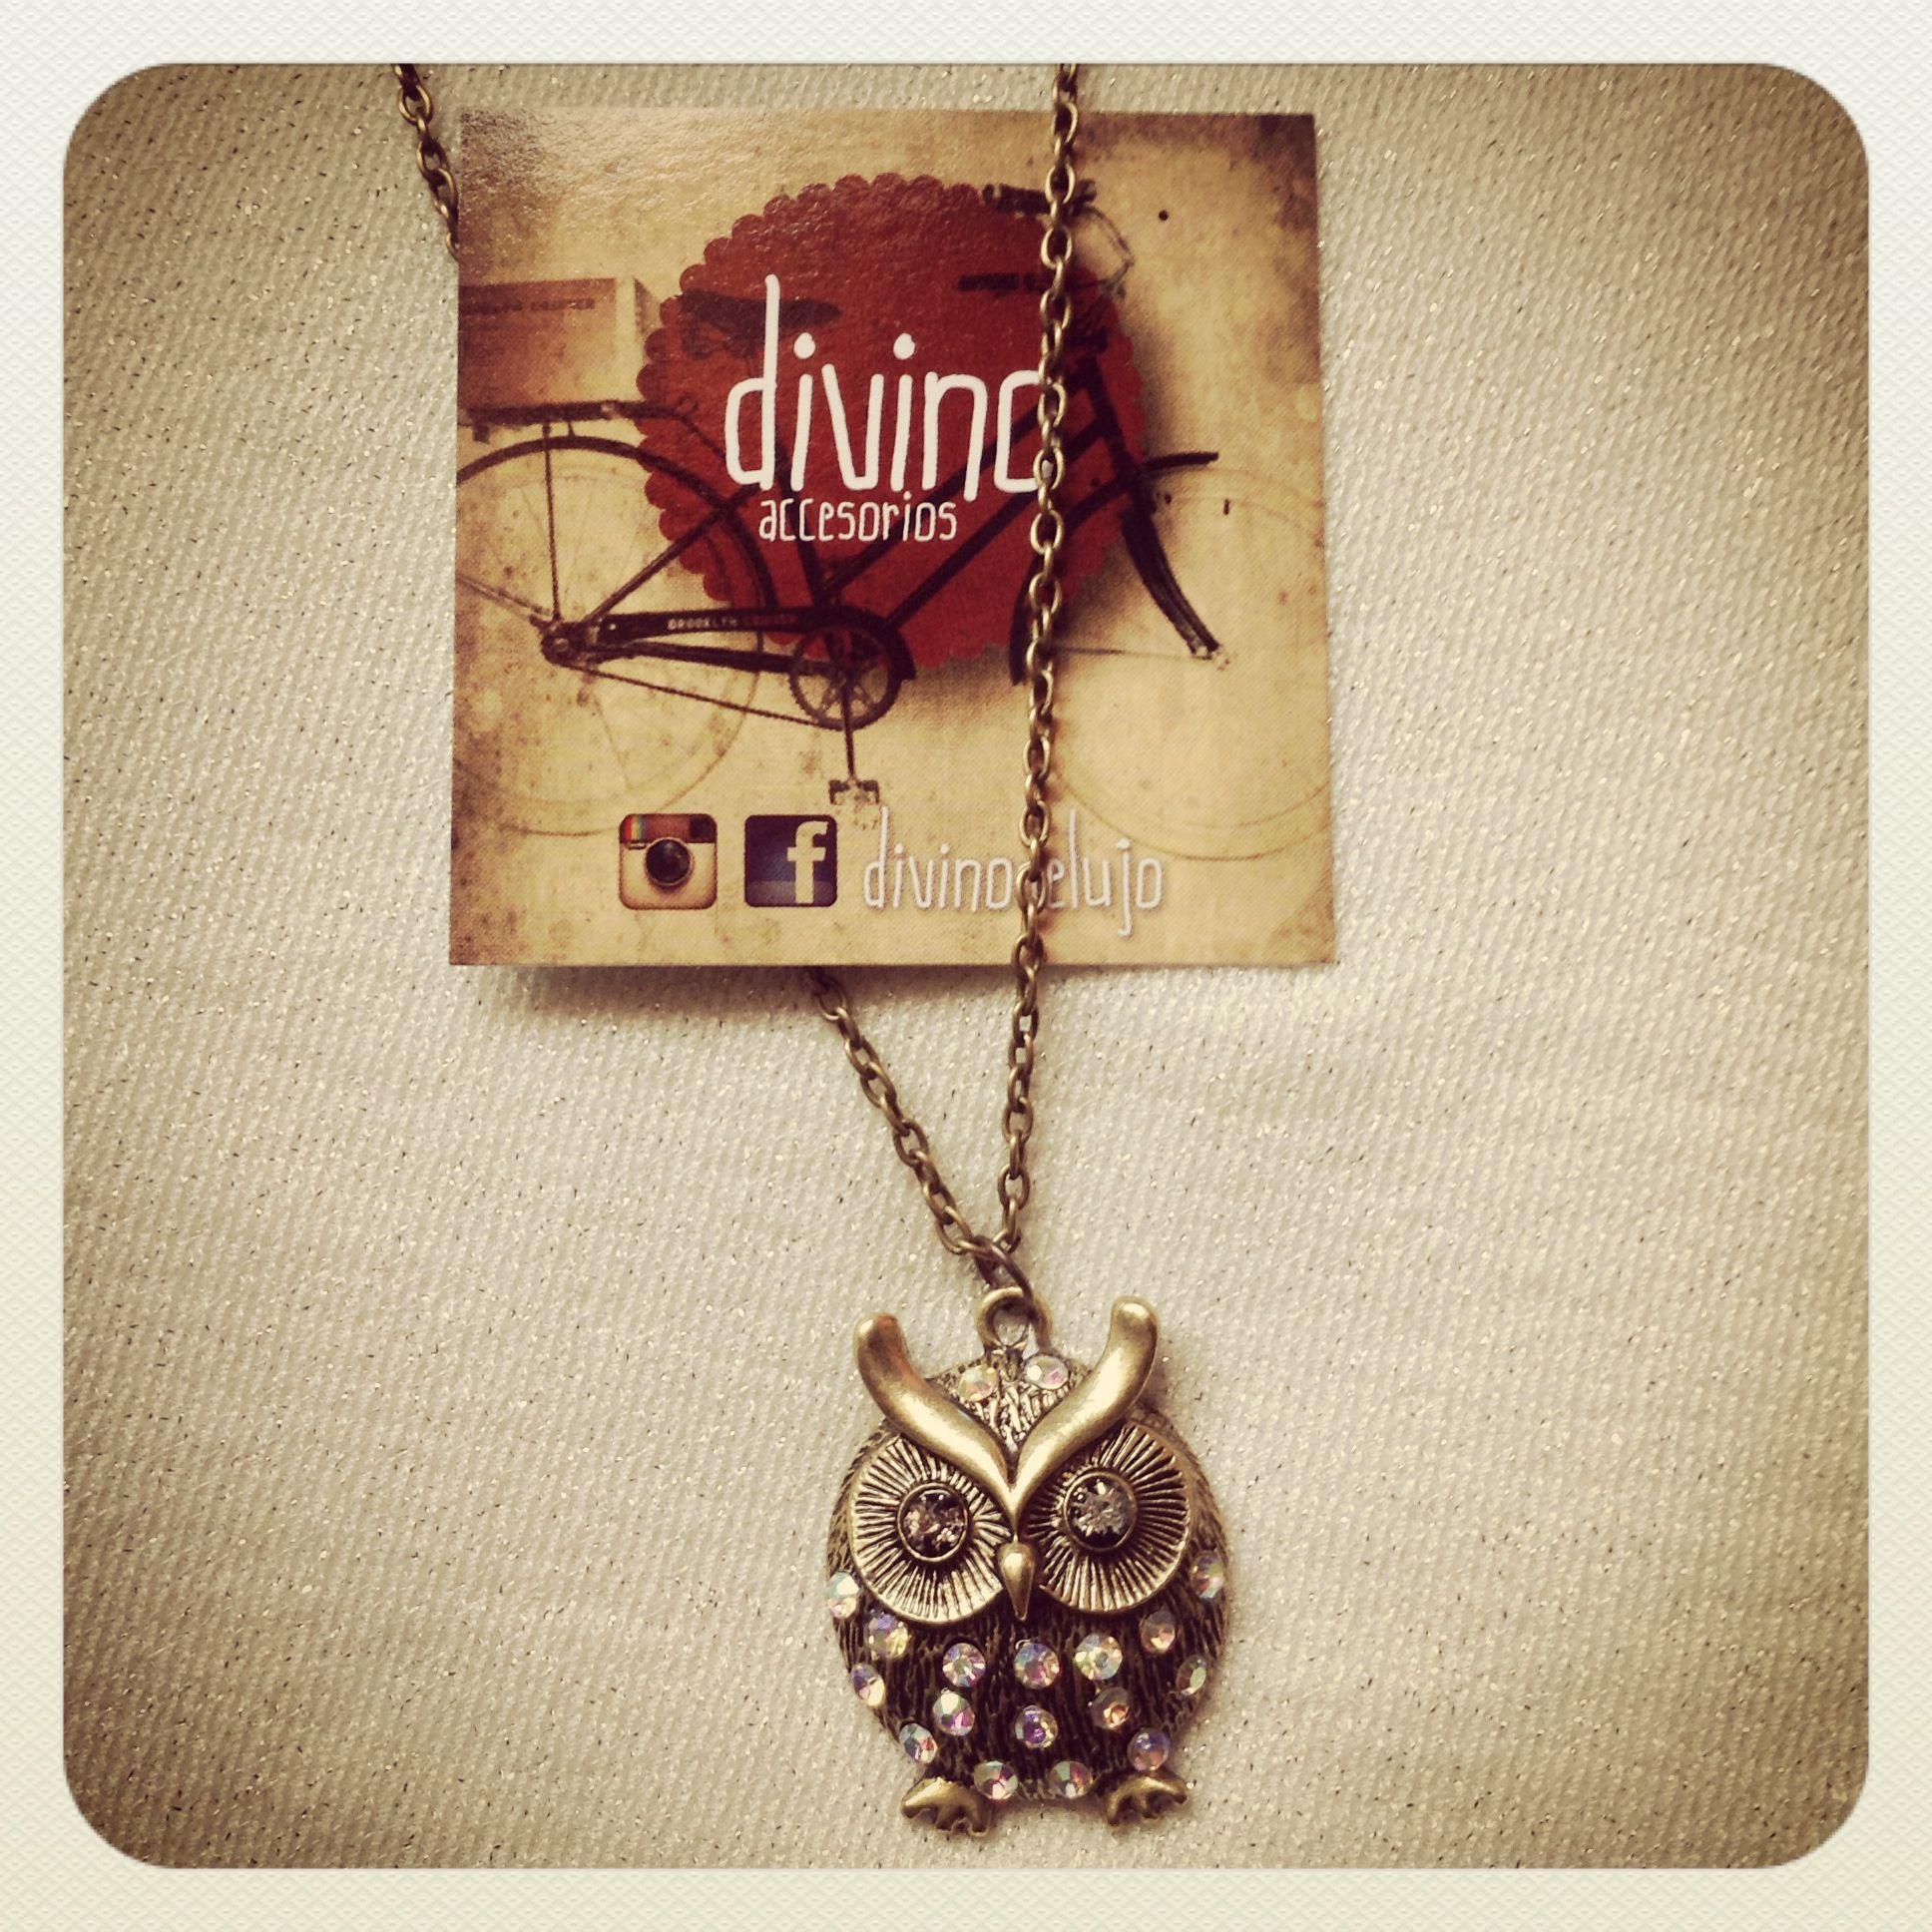 #collar #buho #divinodelujo #divino #fashion #moda